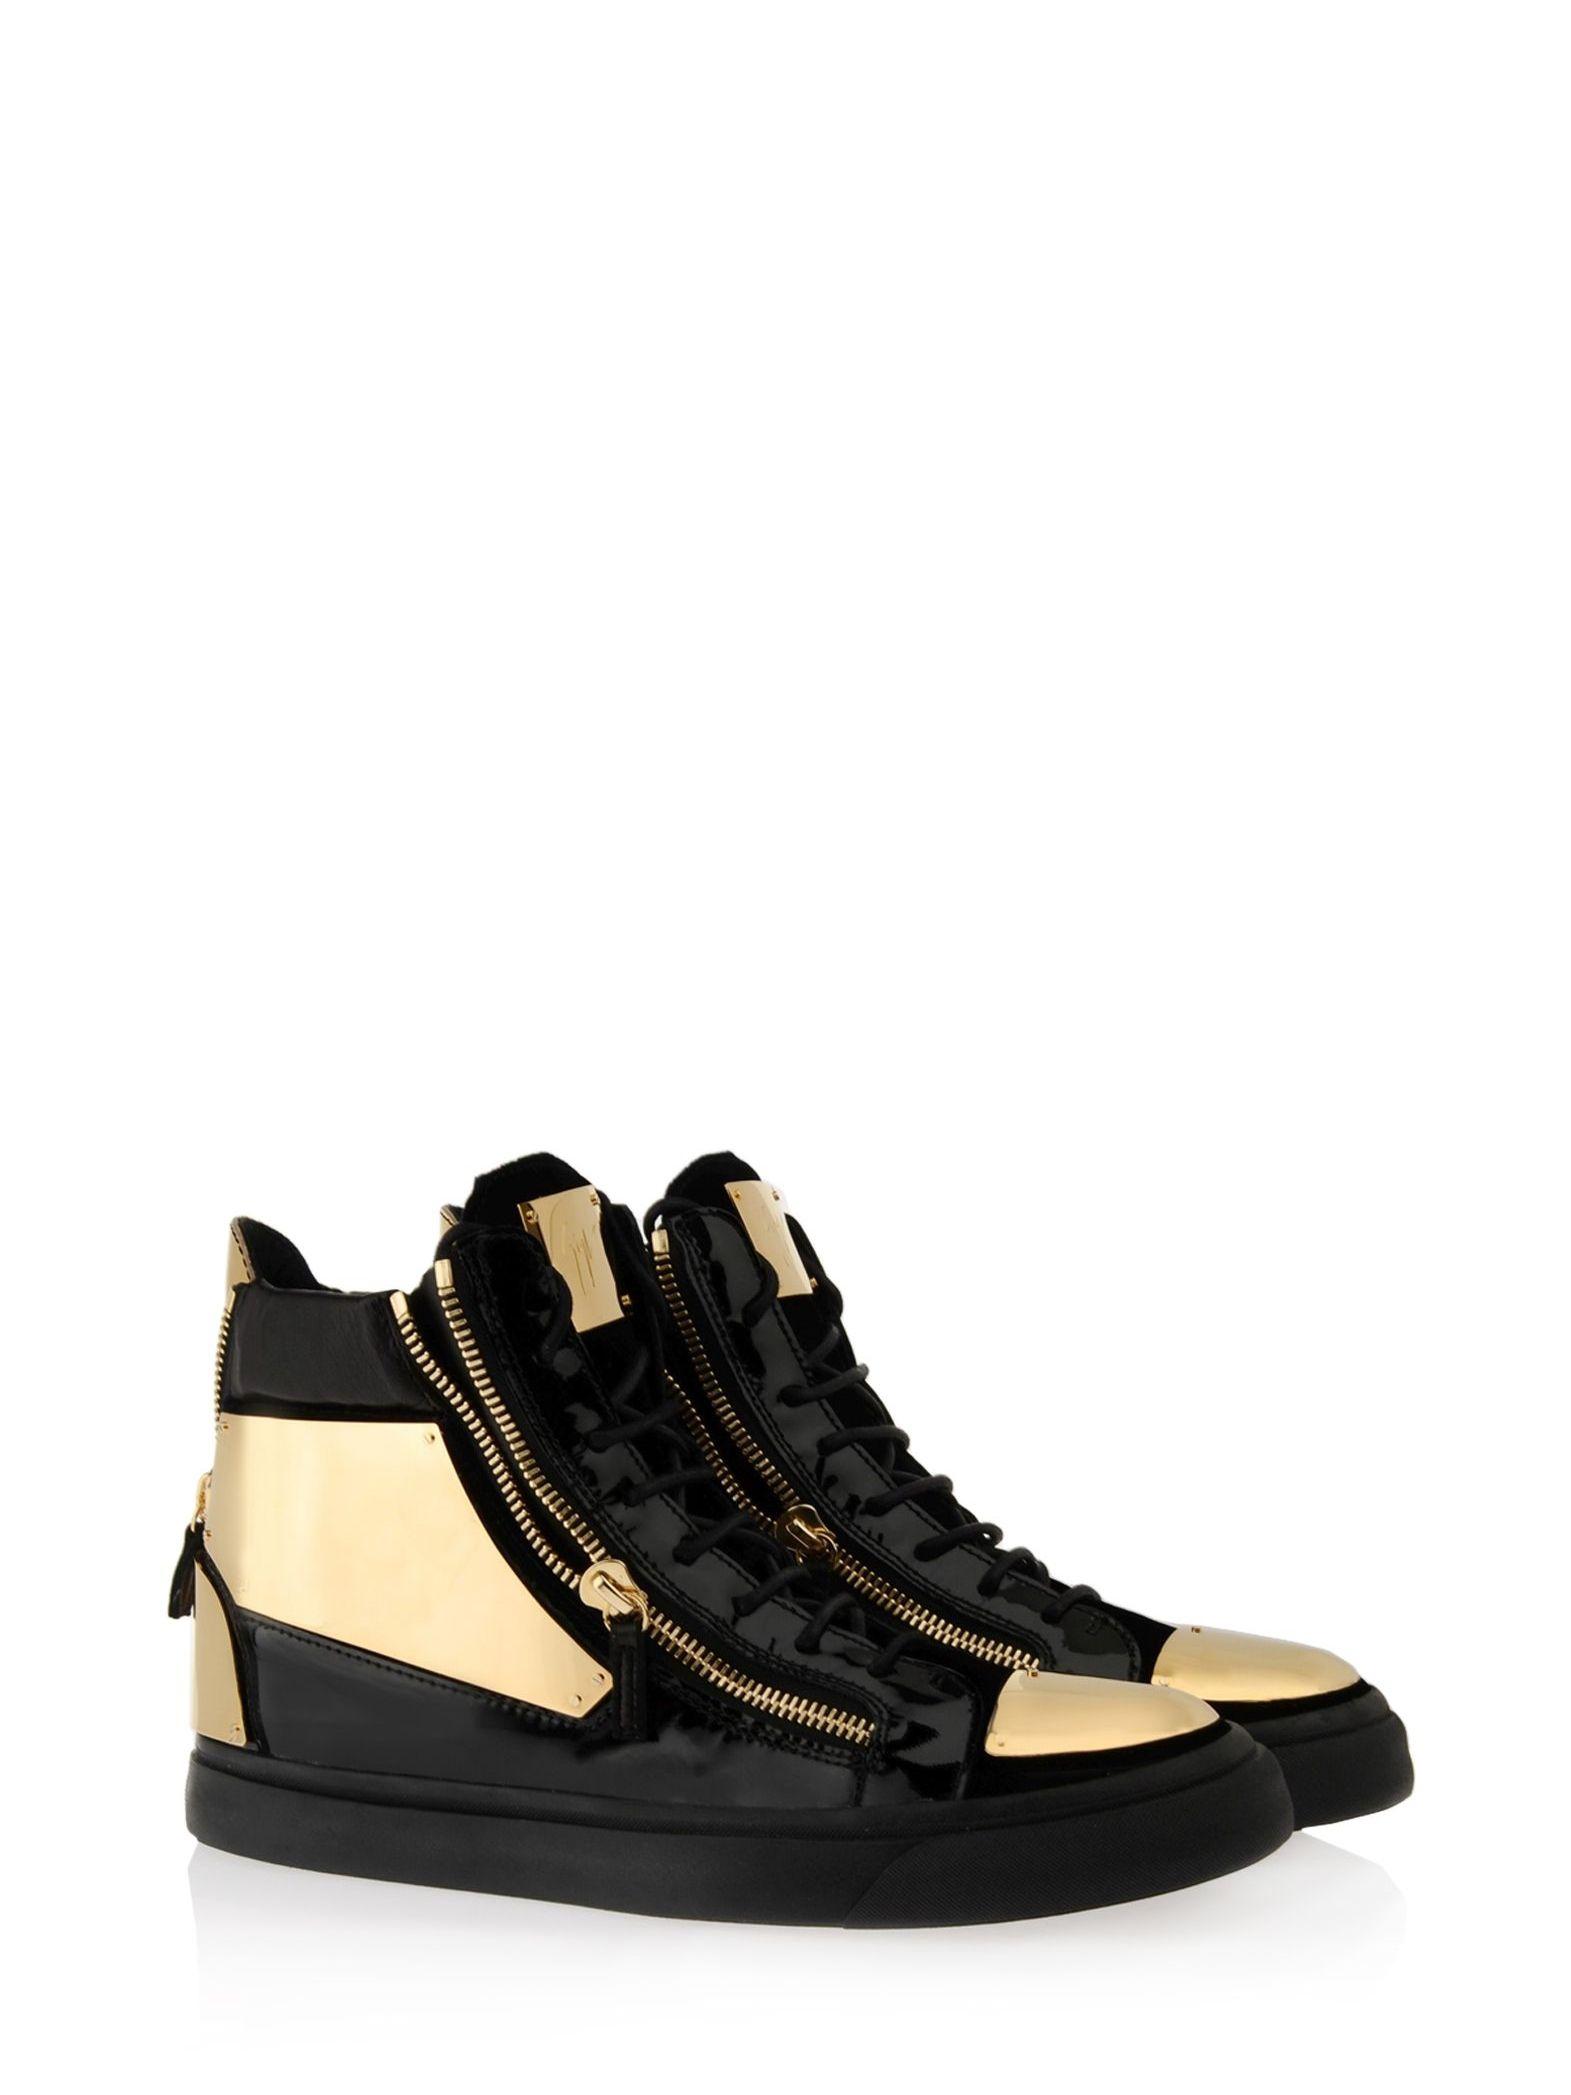 Giuseppe Zanotti - Sneakers - RDU323 001